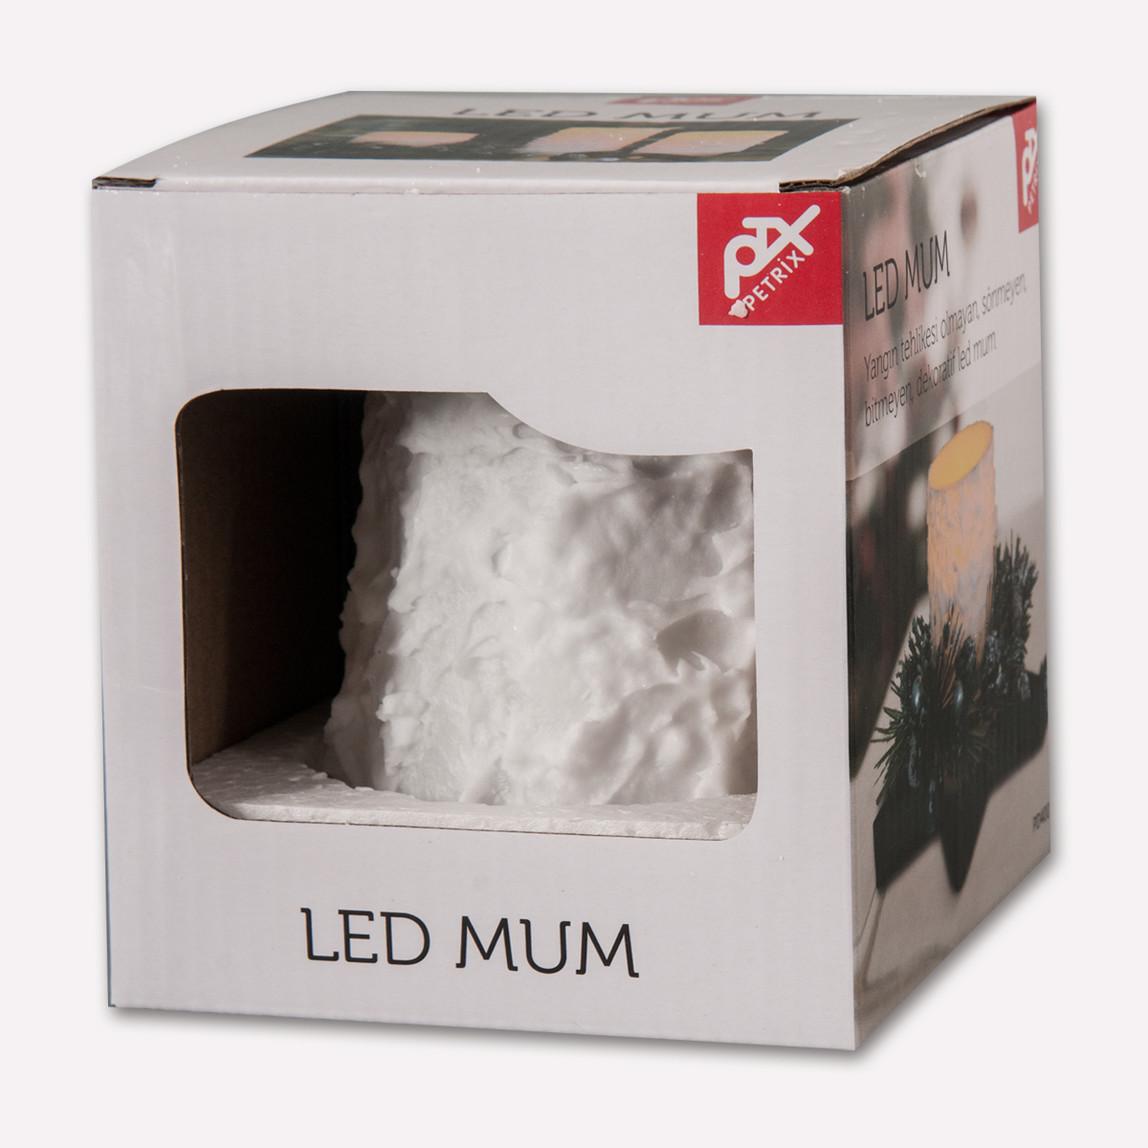 Petrix PD 400 Led Mum Beyaz